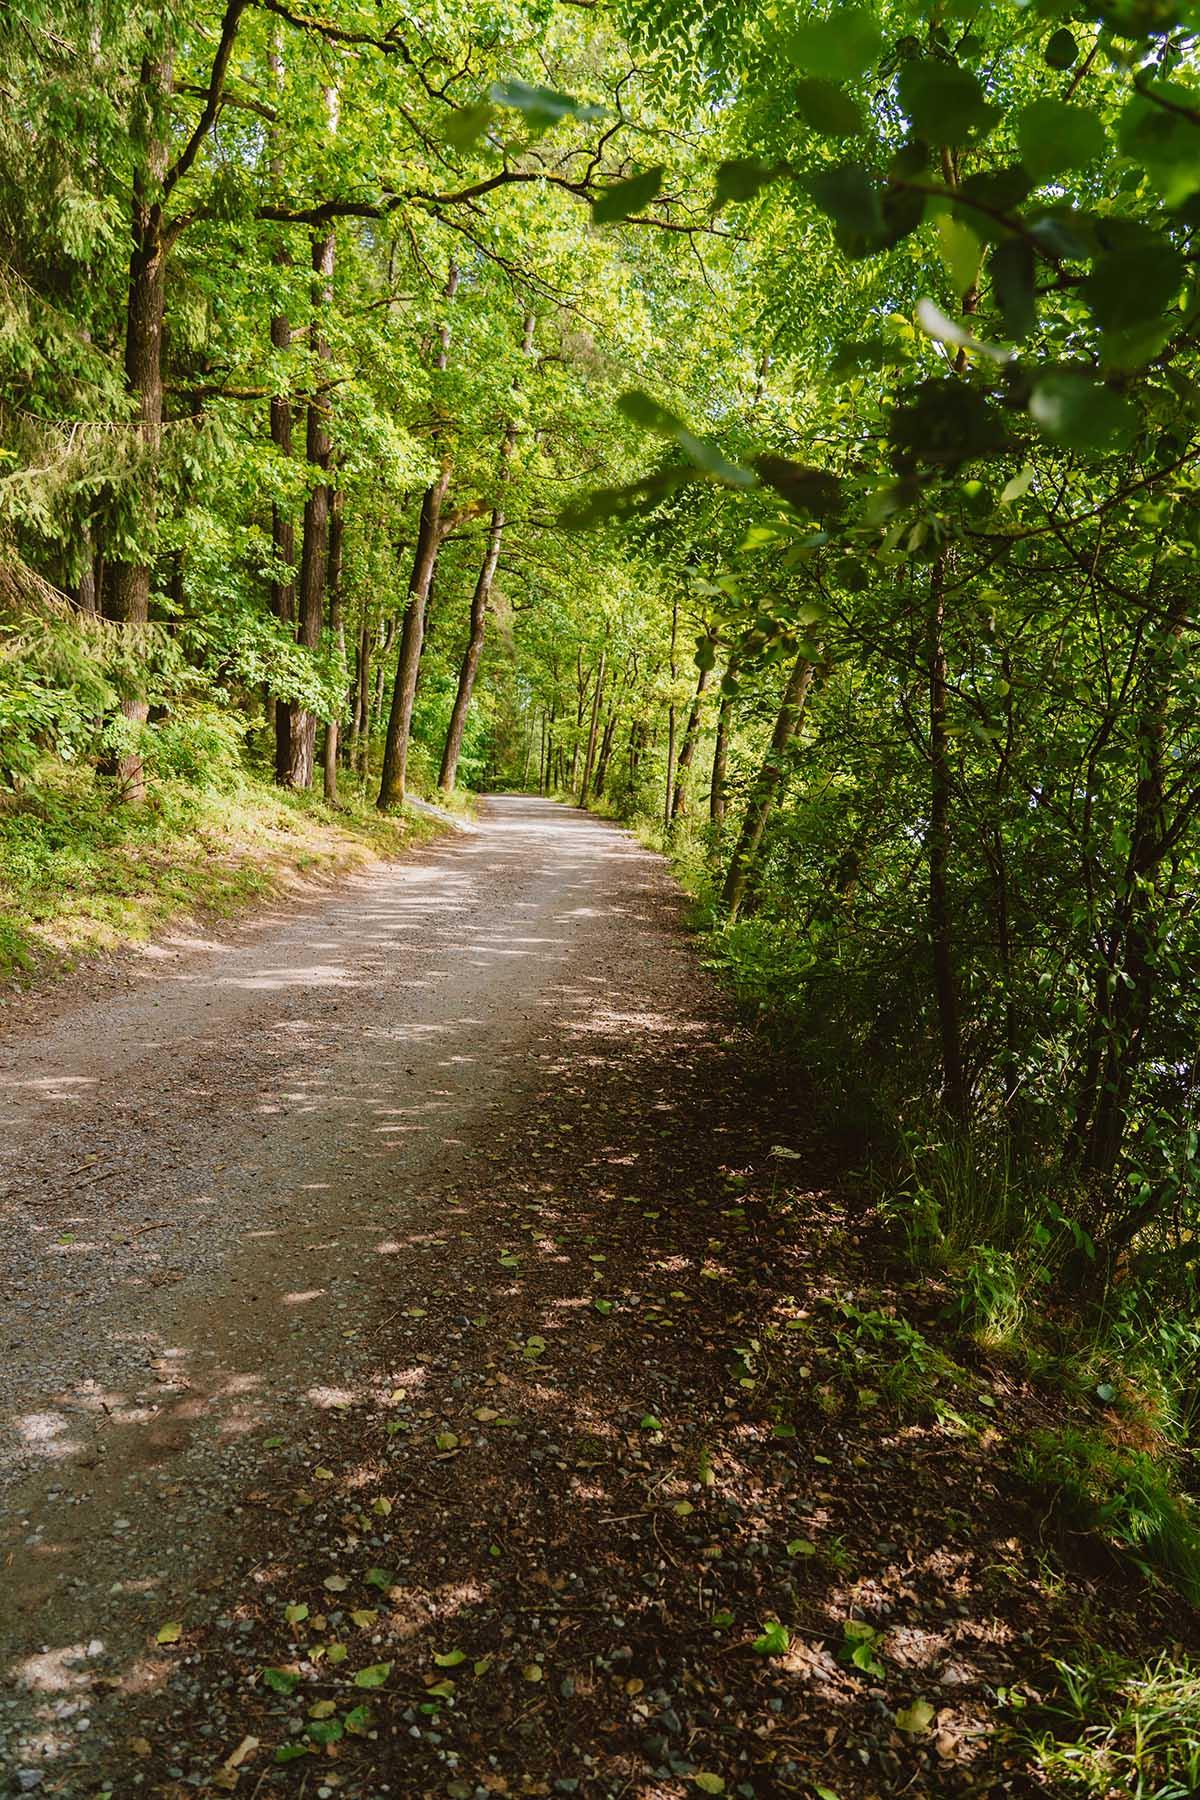 seen-bayerischer-wald-blaibacher-see-rundwanderung